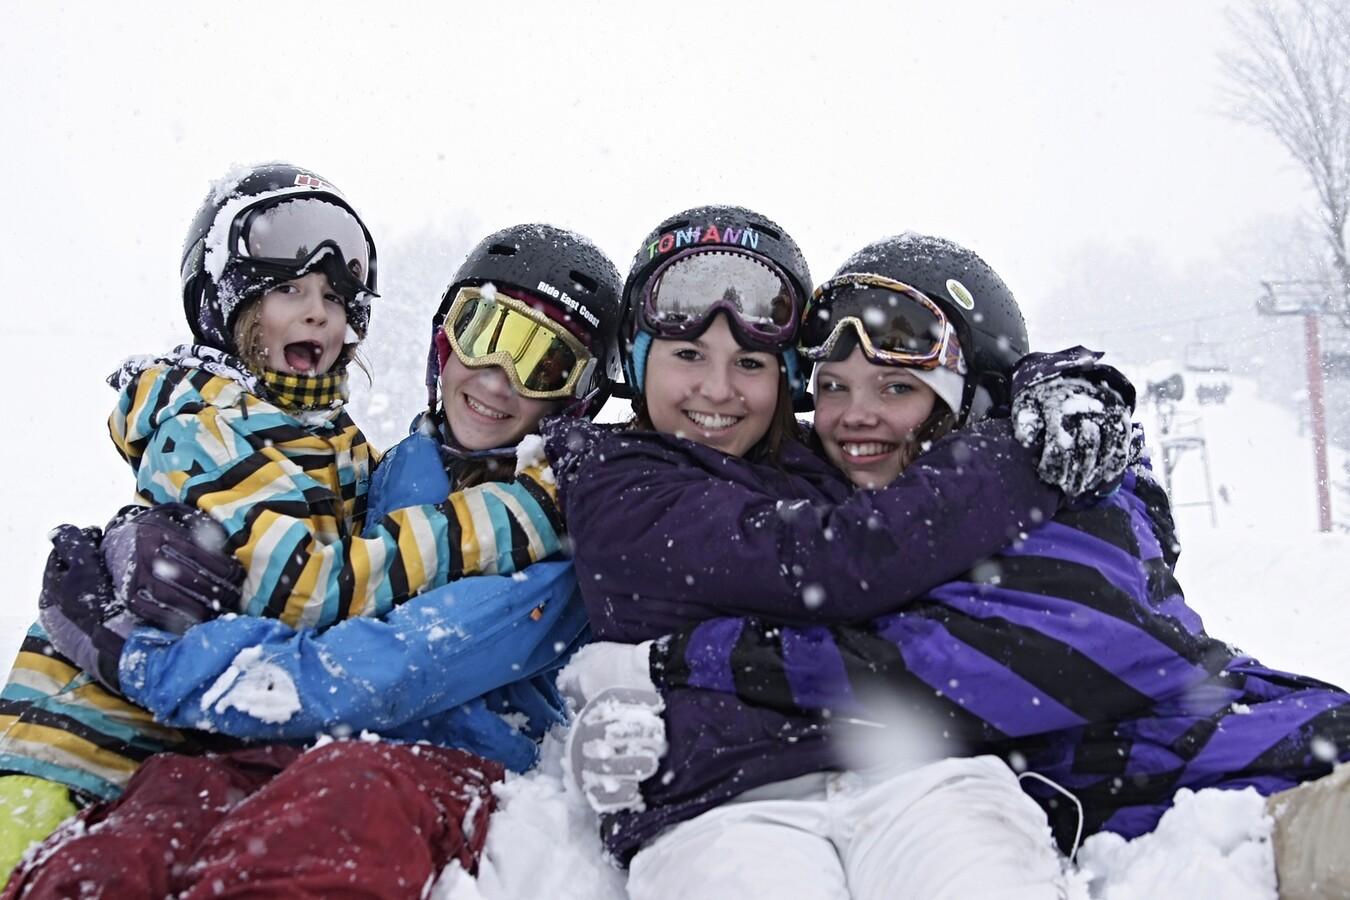 Friends enjoying skiing in the Catskills